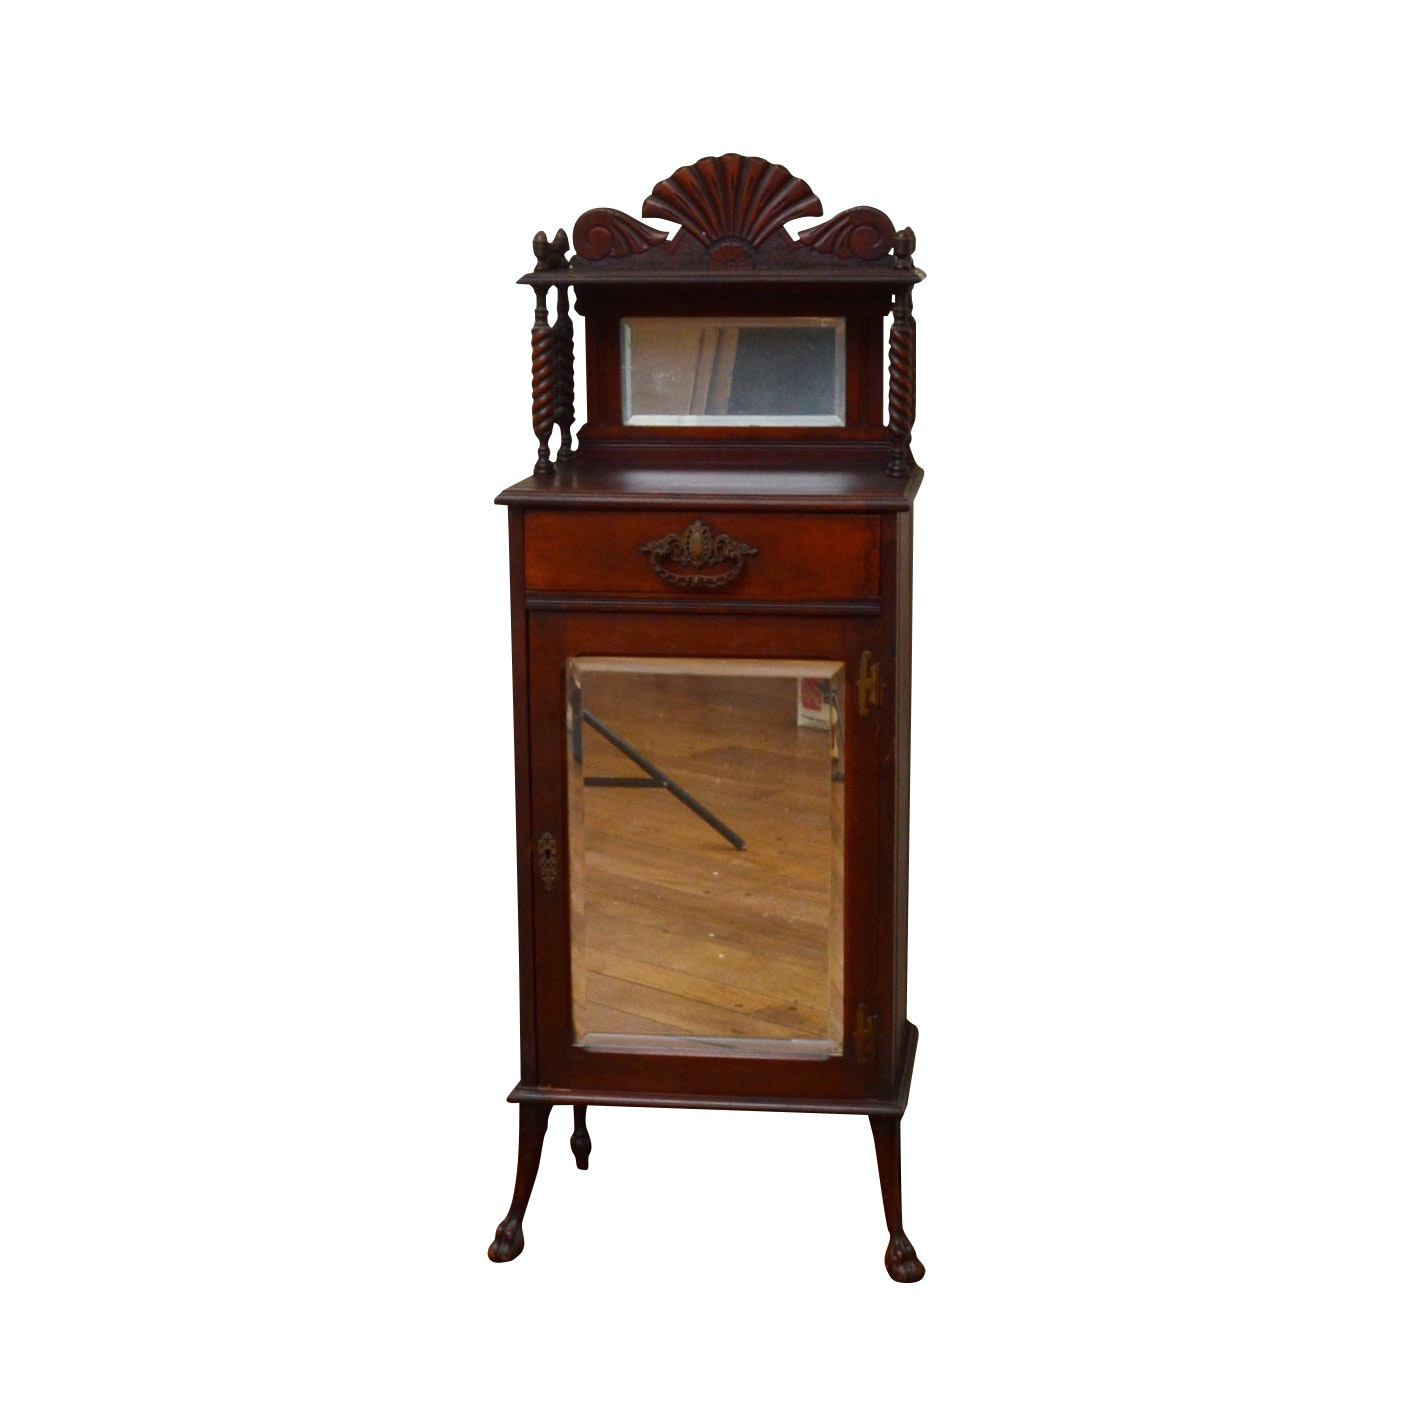 Late Victorian Mahogany-Finish Wooden Mirrored Cabinet, Circa 1890